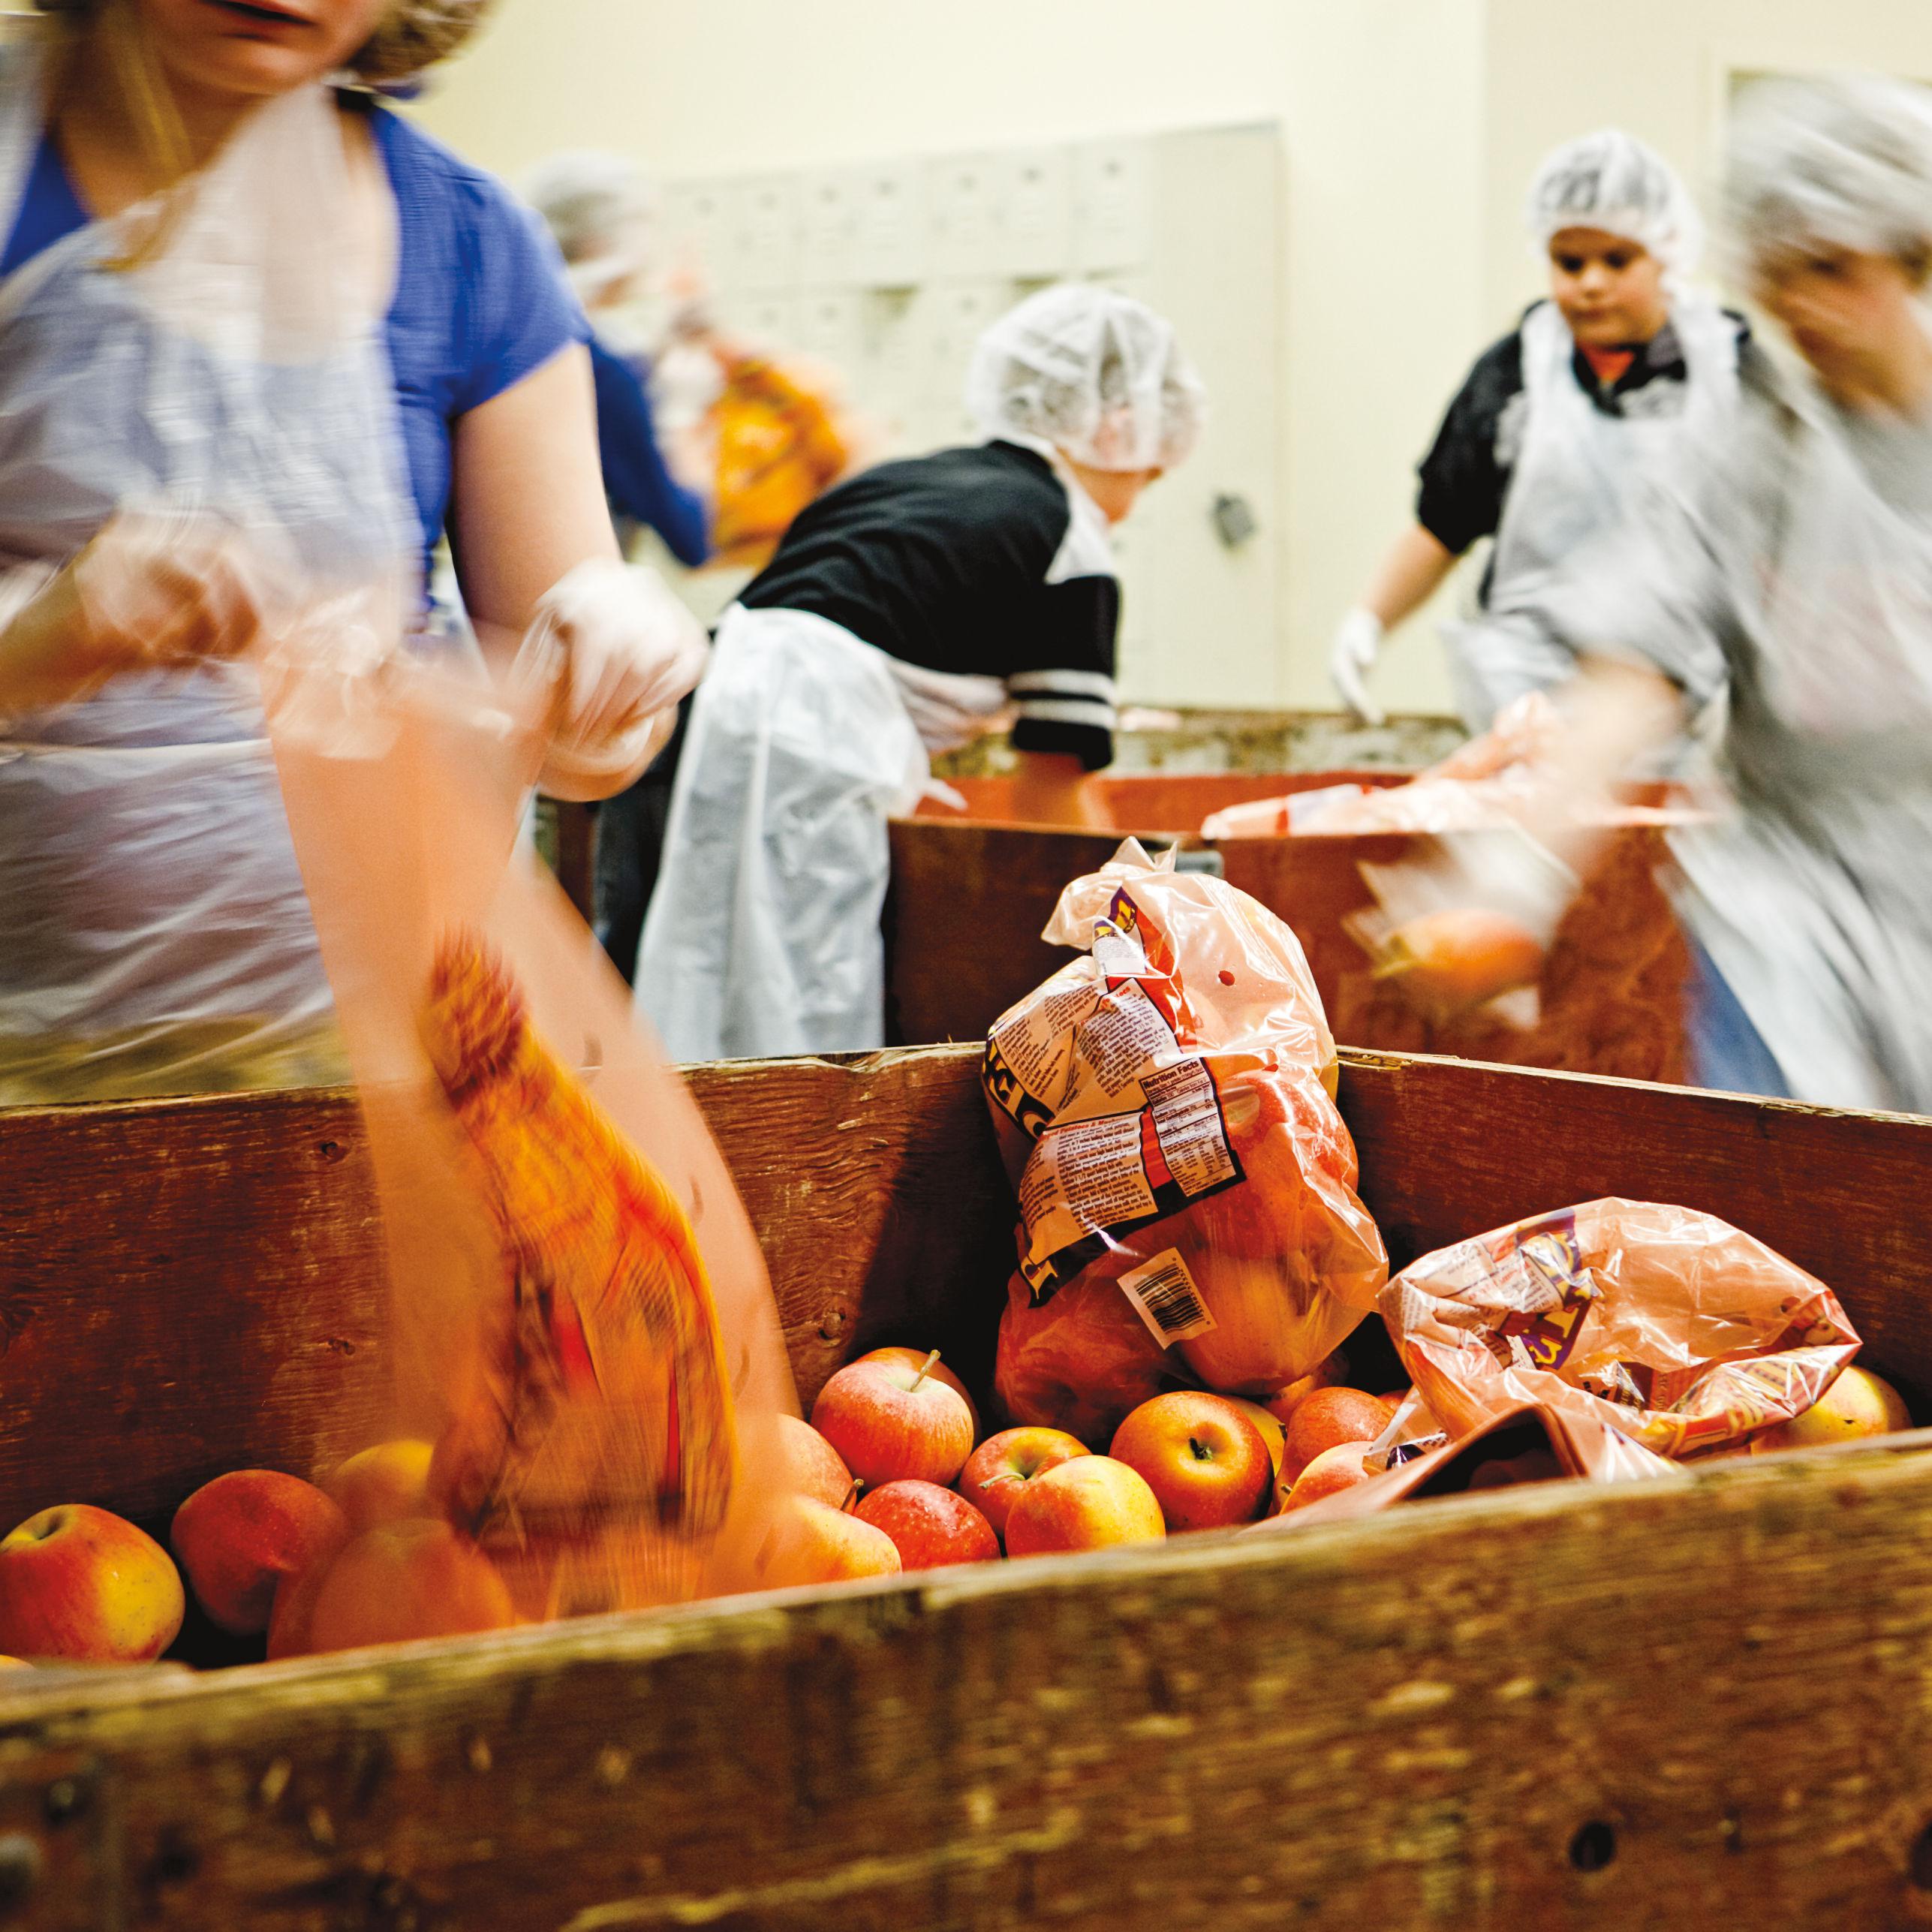 0418 hunger apples ty6pgw